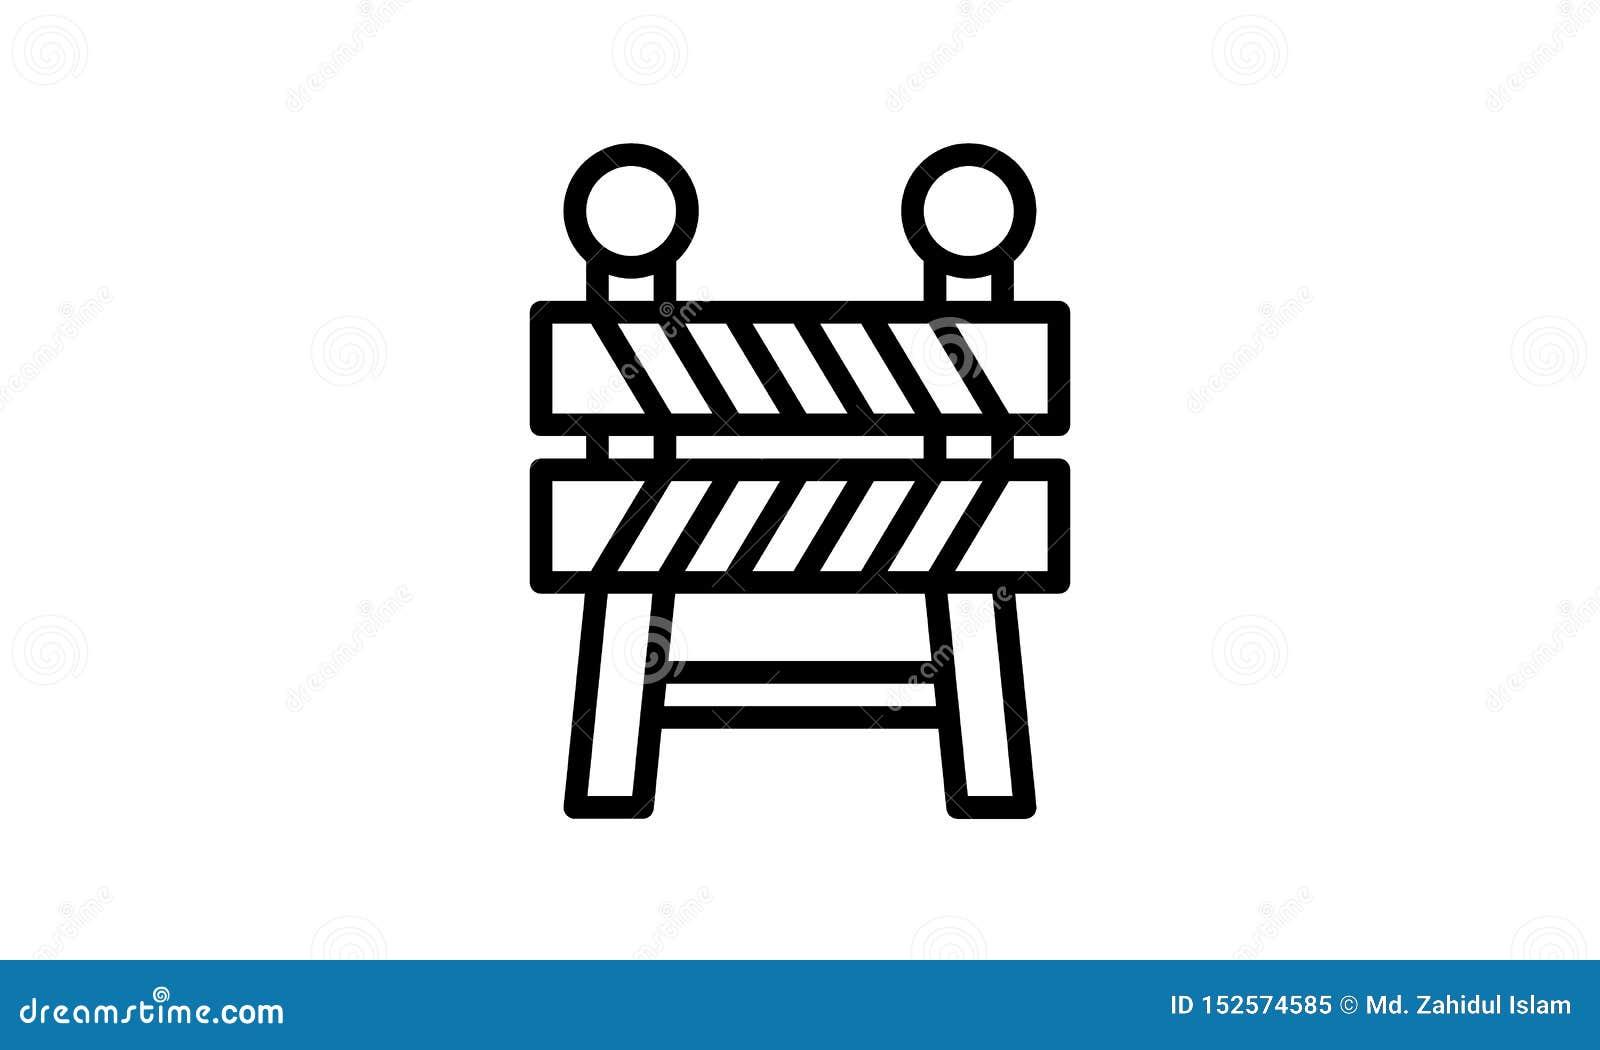 Vektor-Illustrationssymbol der Sperrenikone flaches